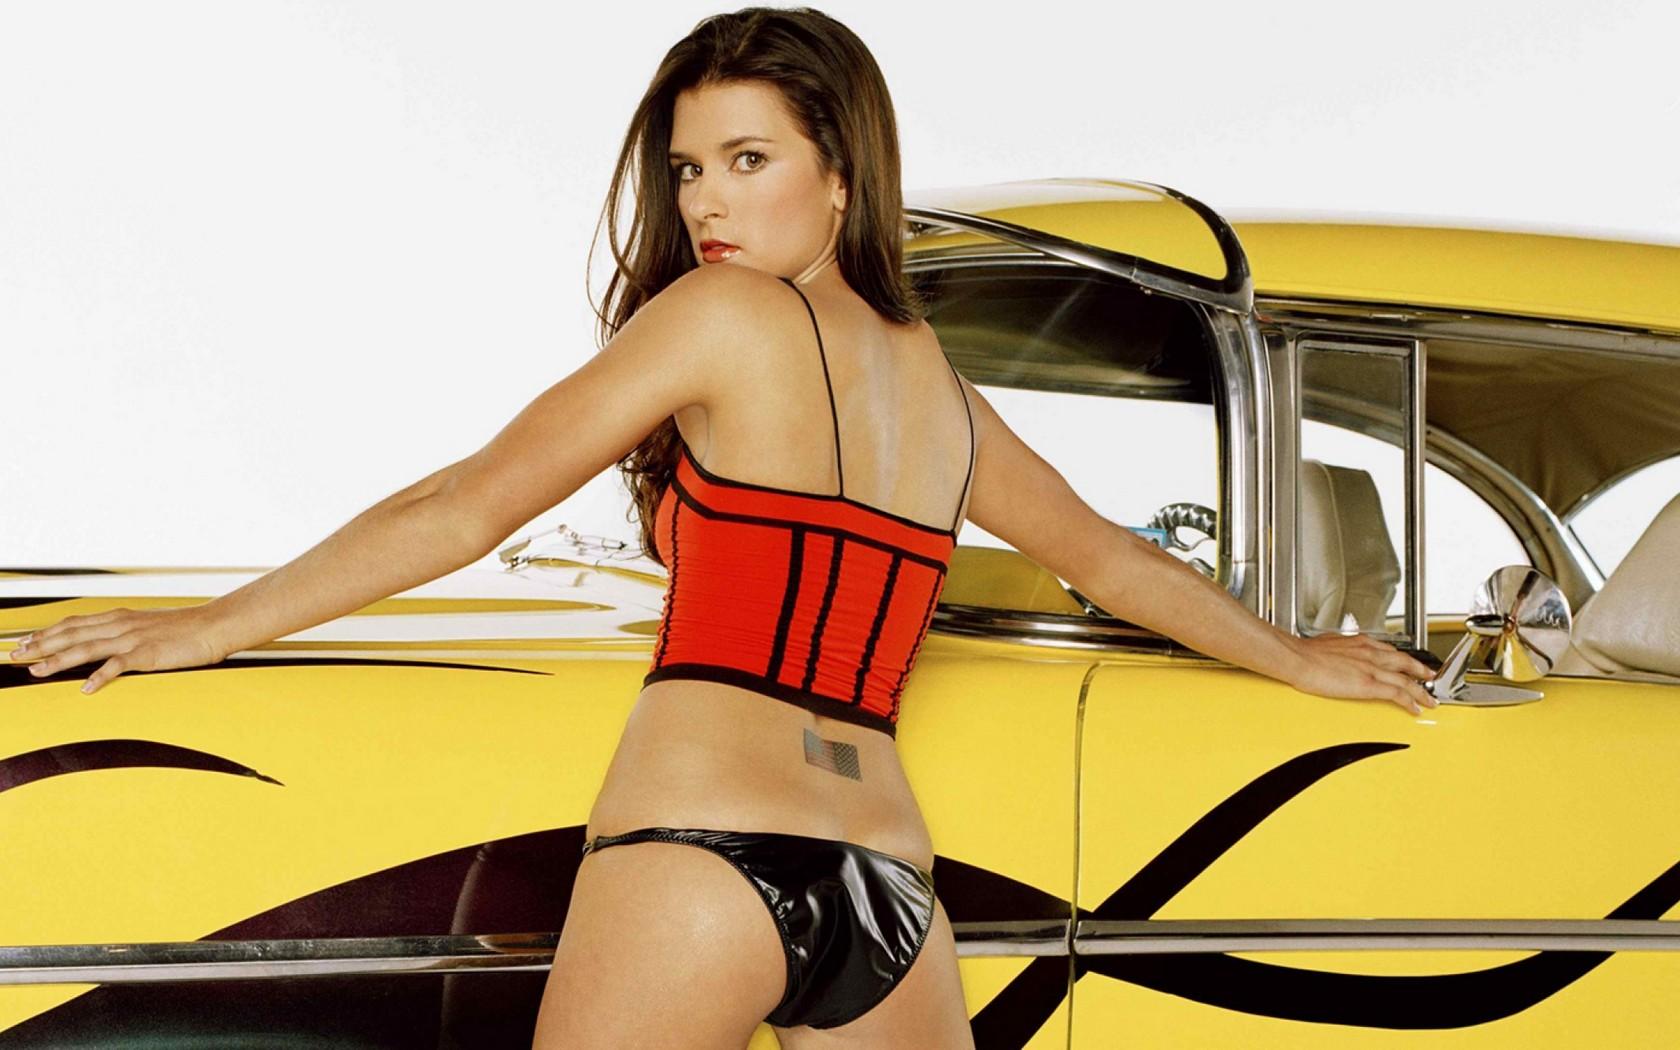 Danica Patrick Rides Can-Am Spyder at Long Beach IMS - autoevolution